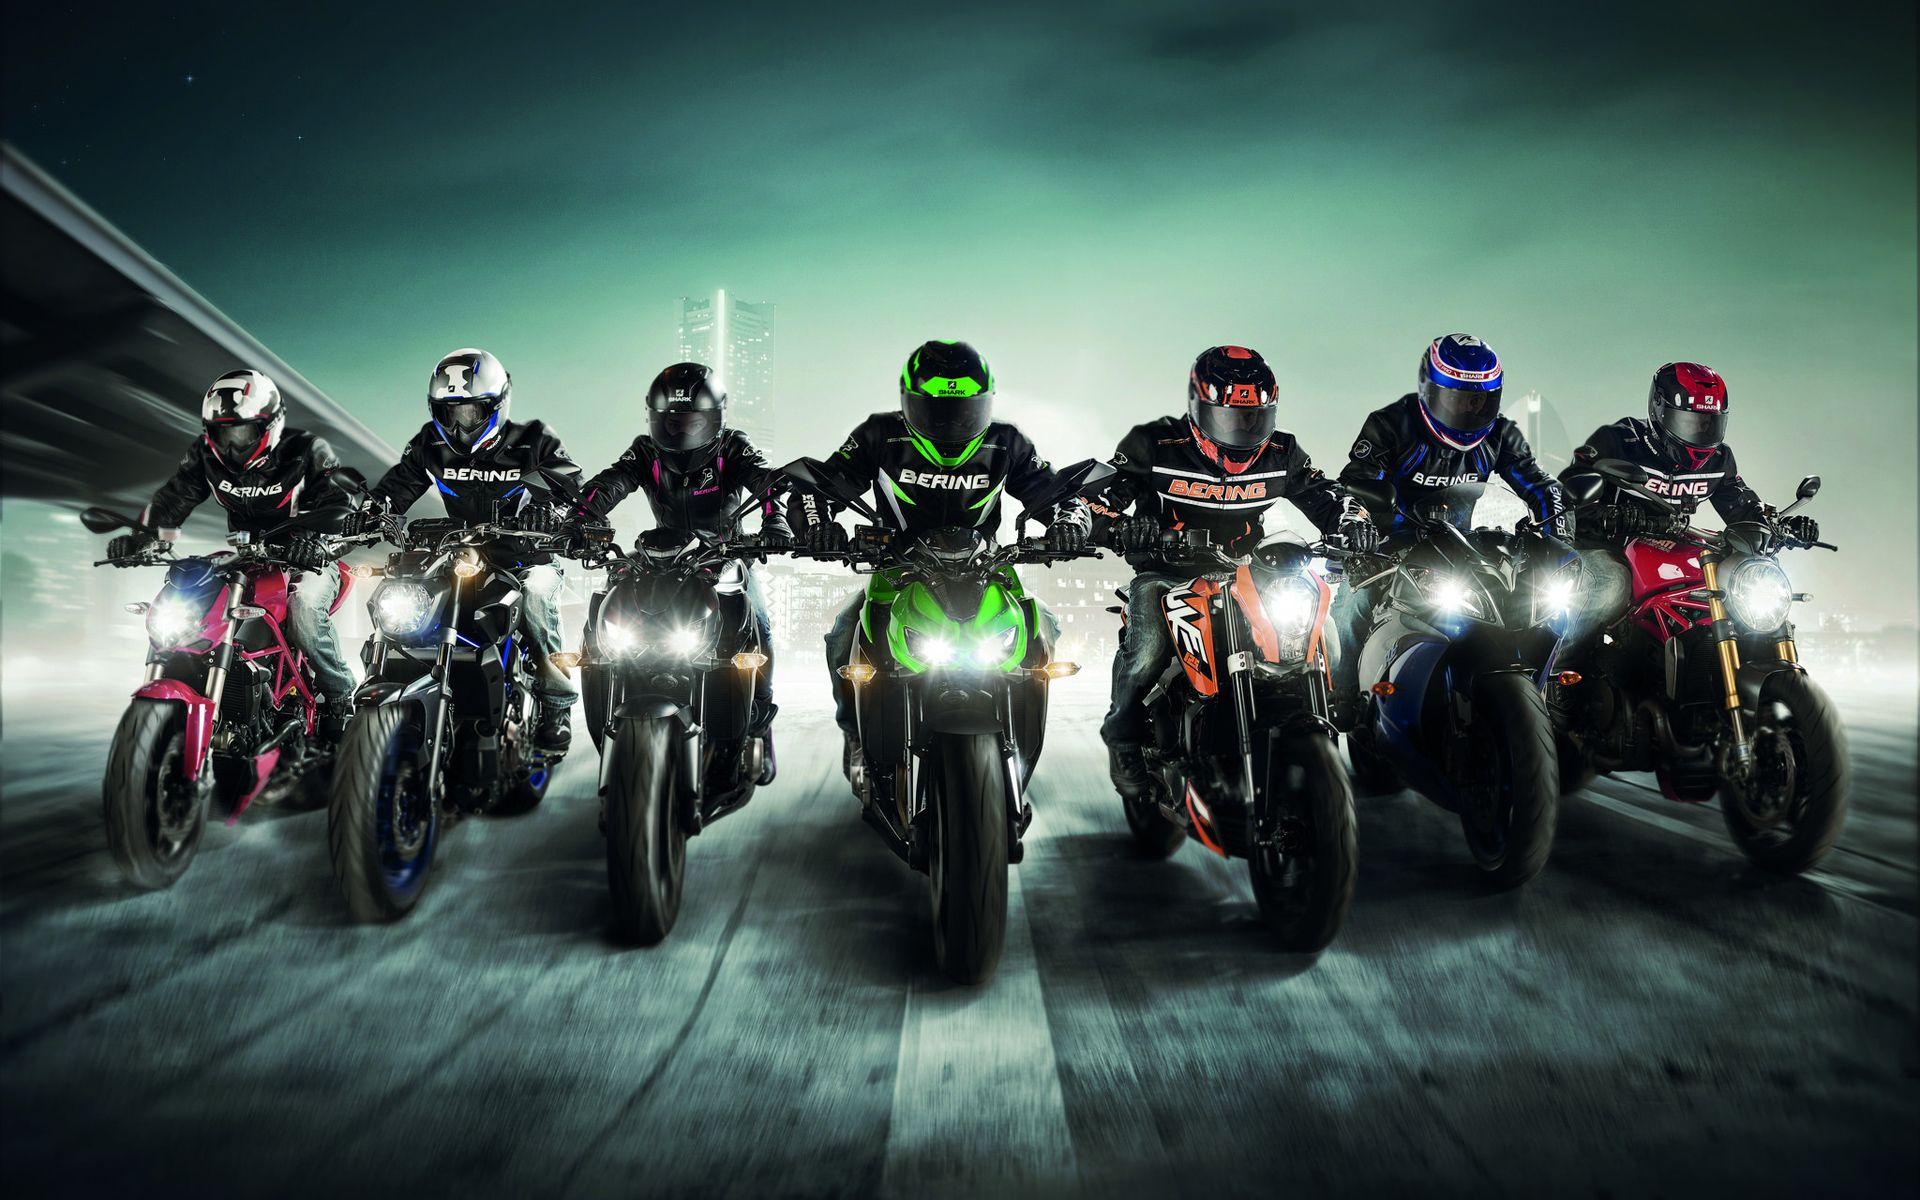 Motorcycle HD Wallpapers 2 Racing artwork Yamaha bikes Yamaha 1920x1200